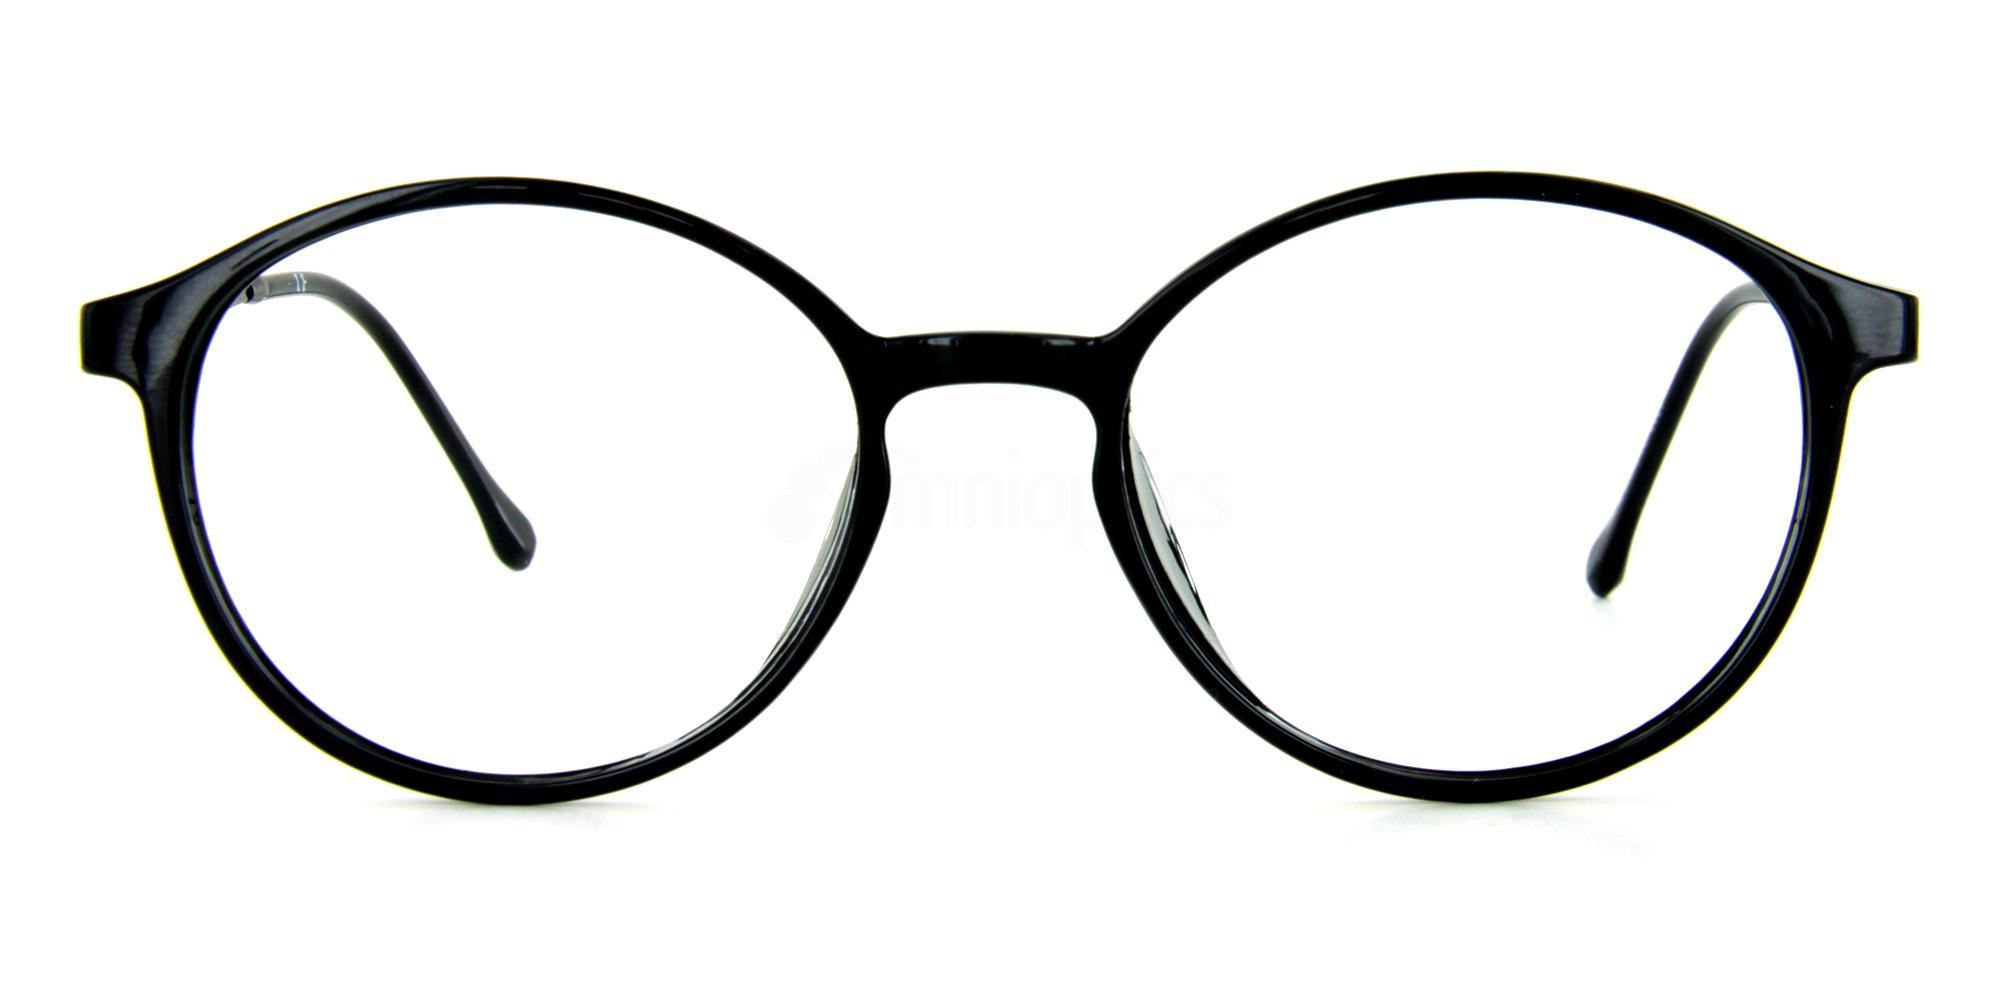 C1 TR8218 Glasses, Savannah